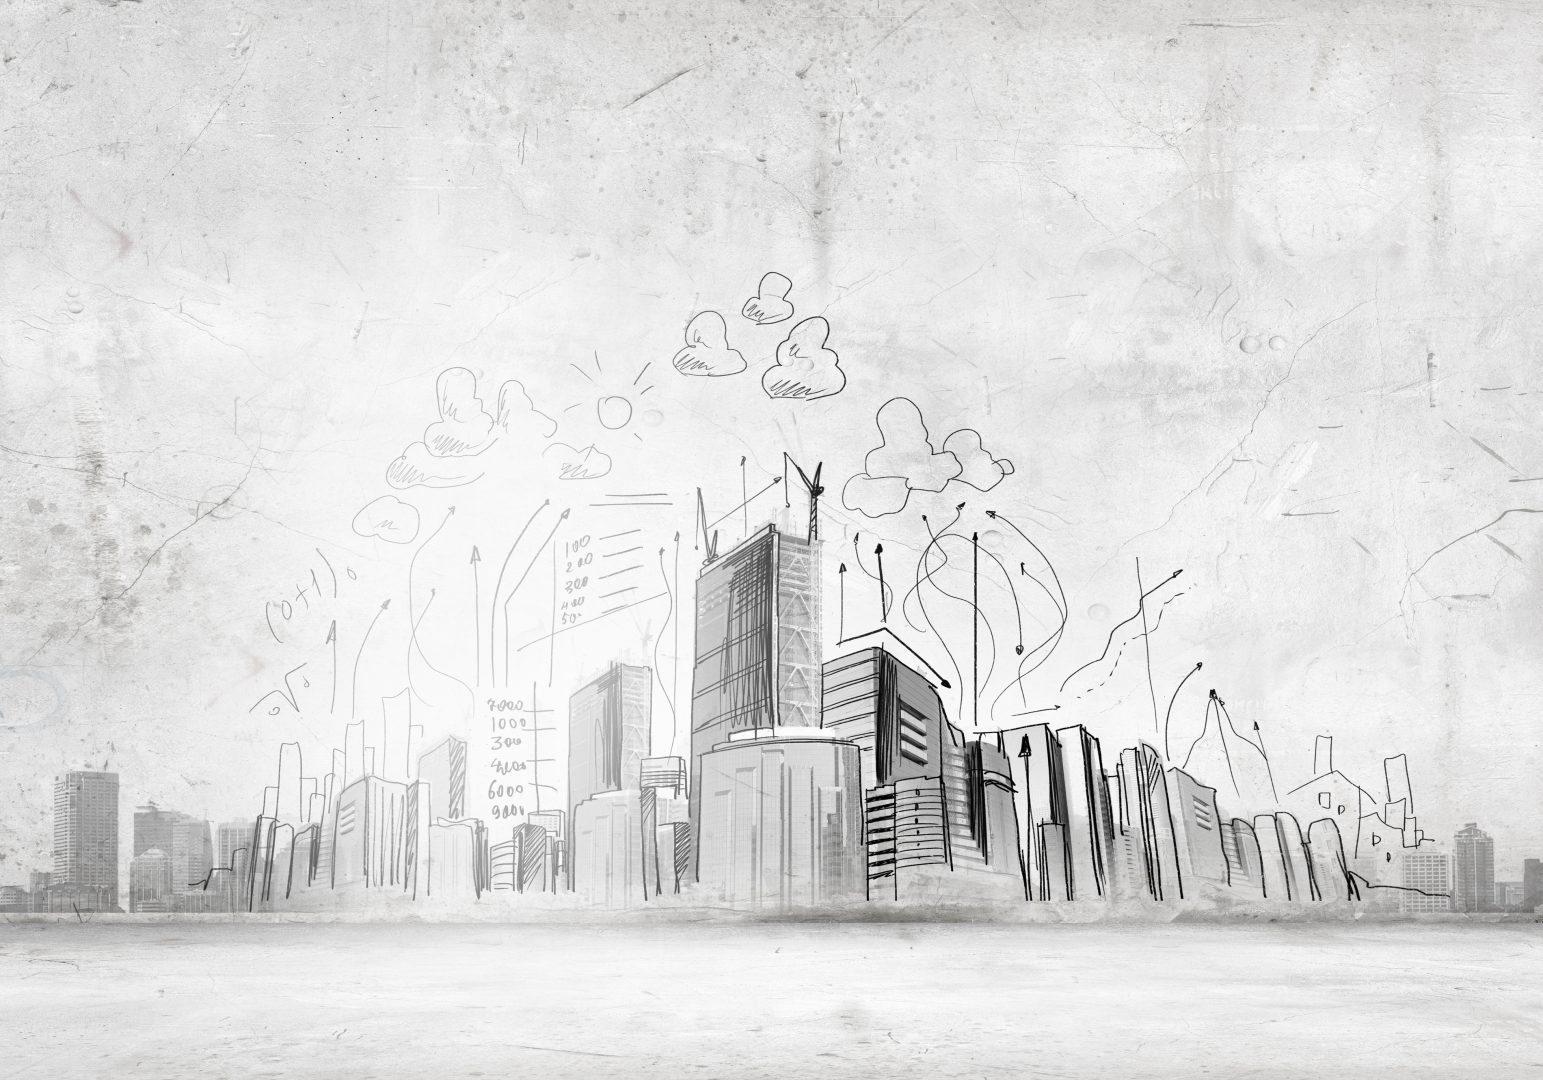 A sketch over a city where companies balance growth and profitability